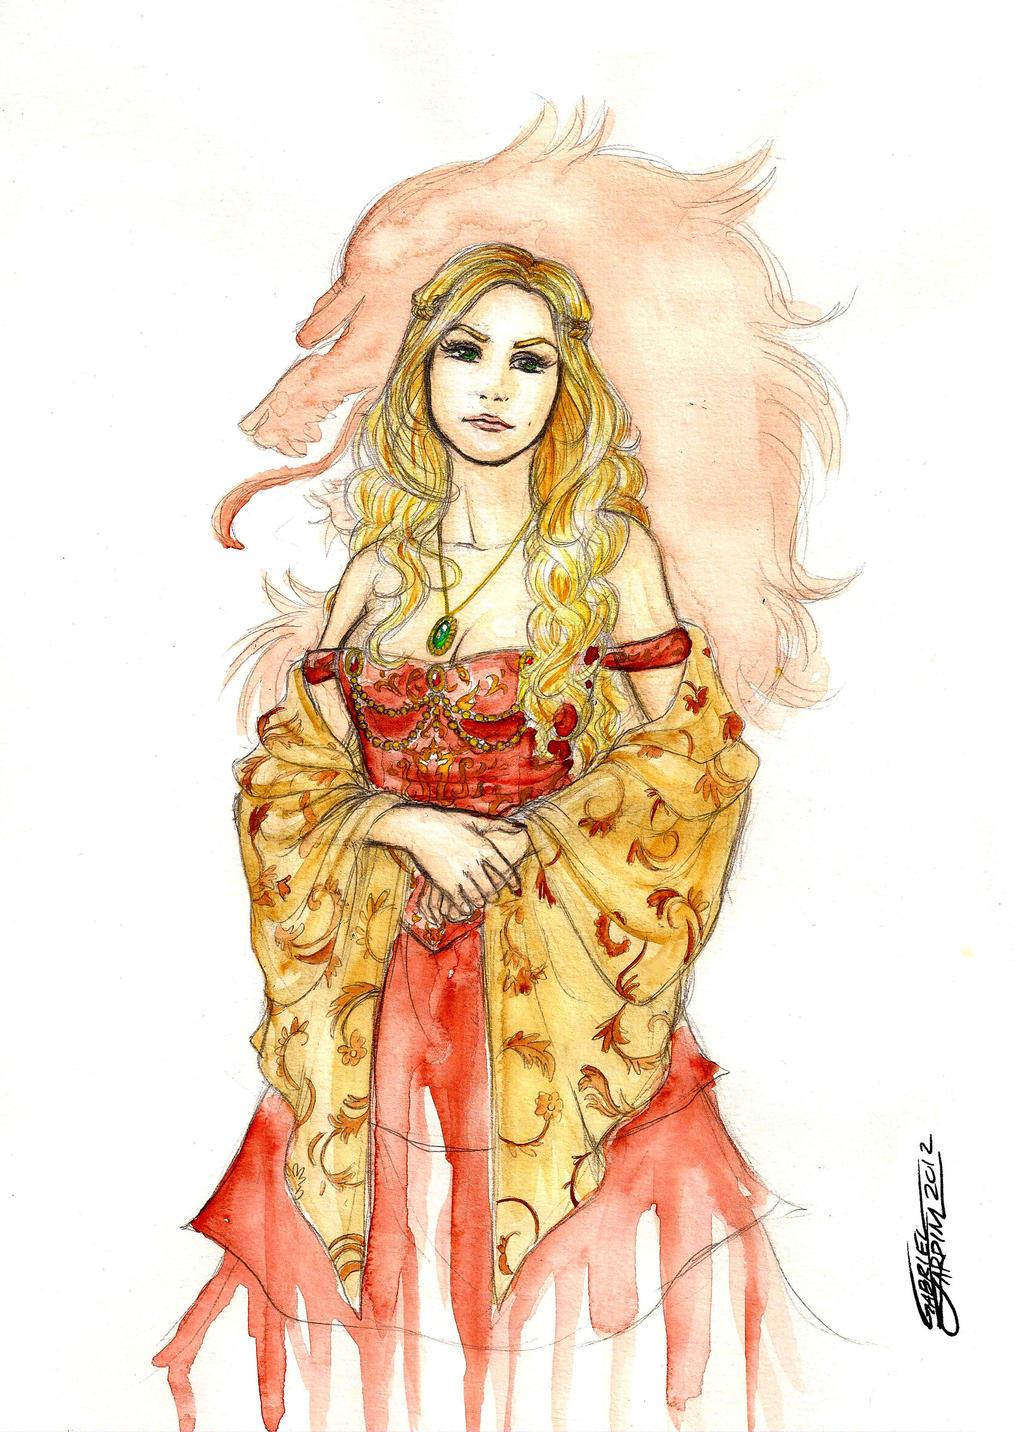 Cersei Lannister by GabrielJardim